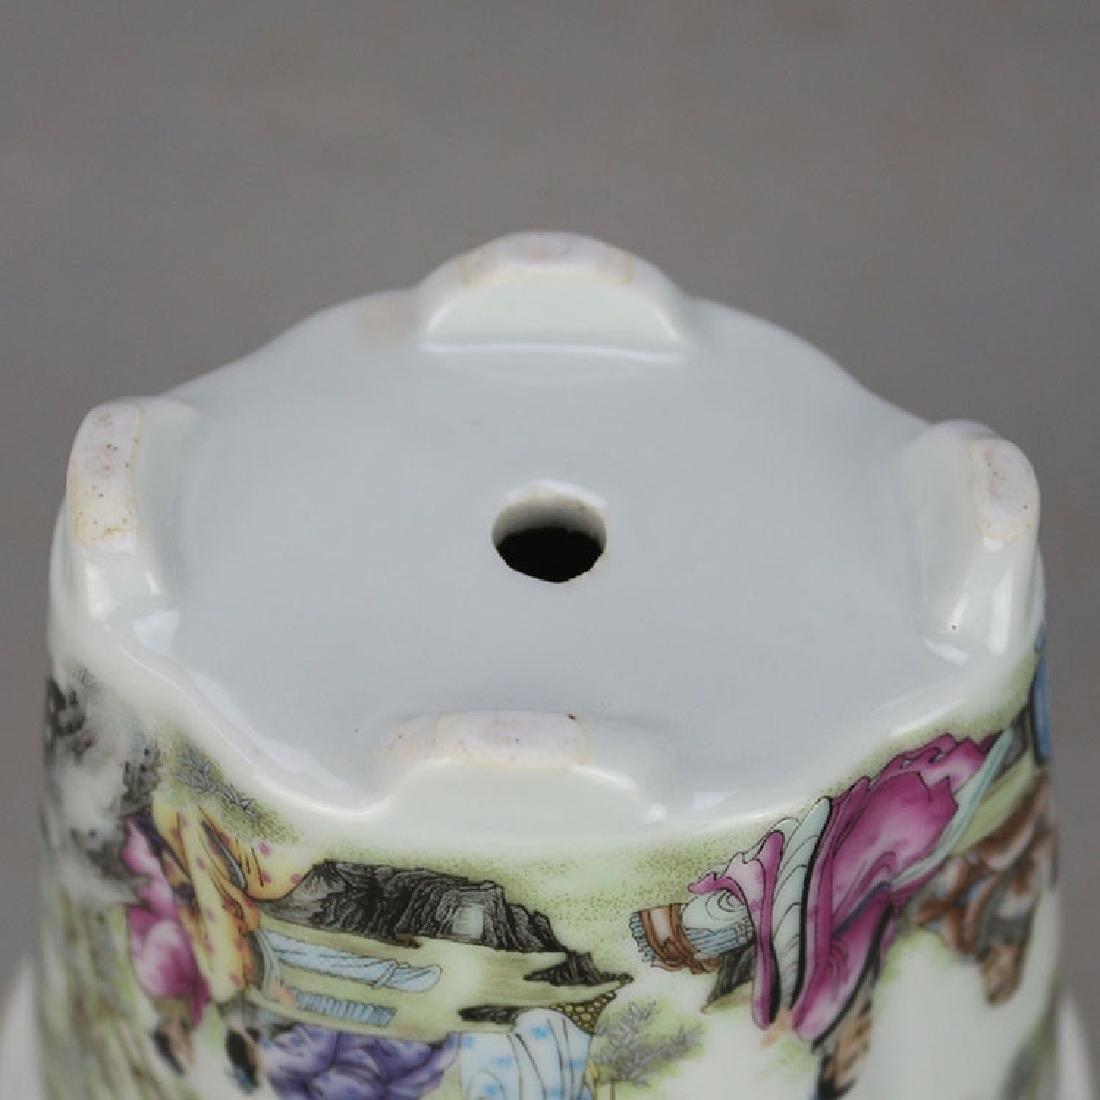 Chinese Antique Famille-Rose Porcelain Flower Pot - 6